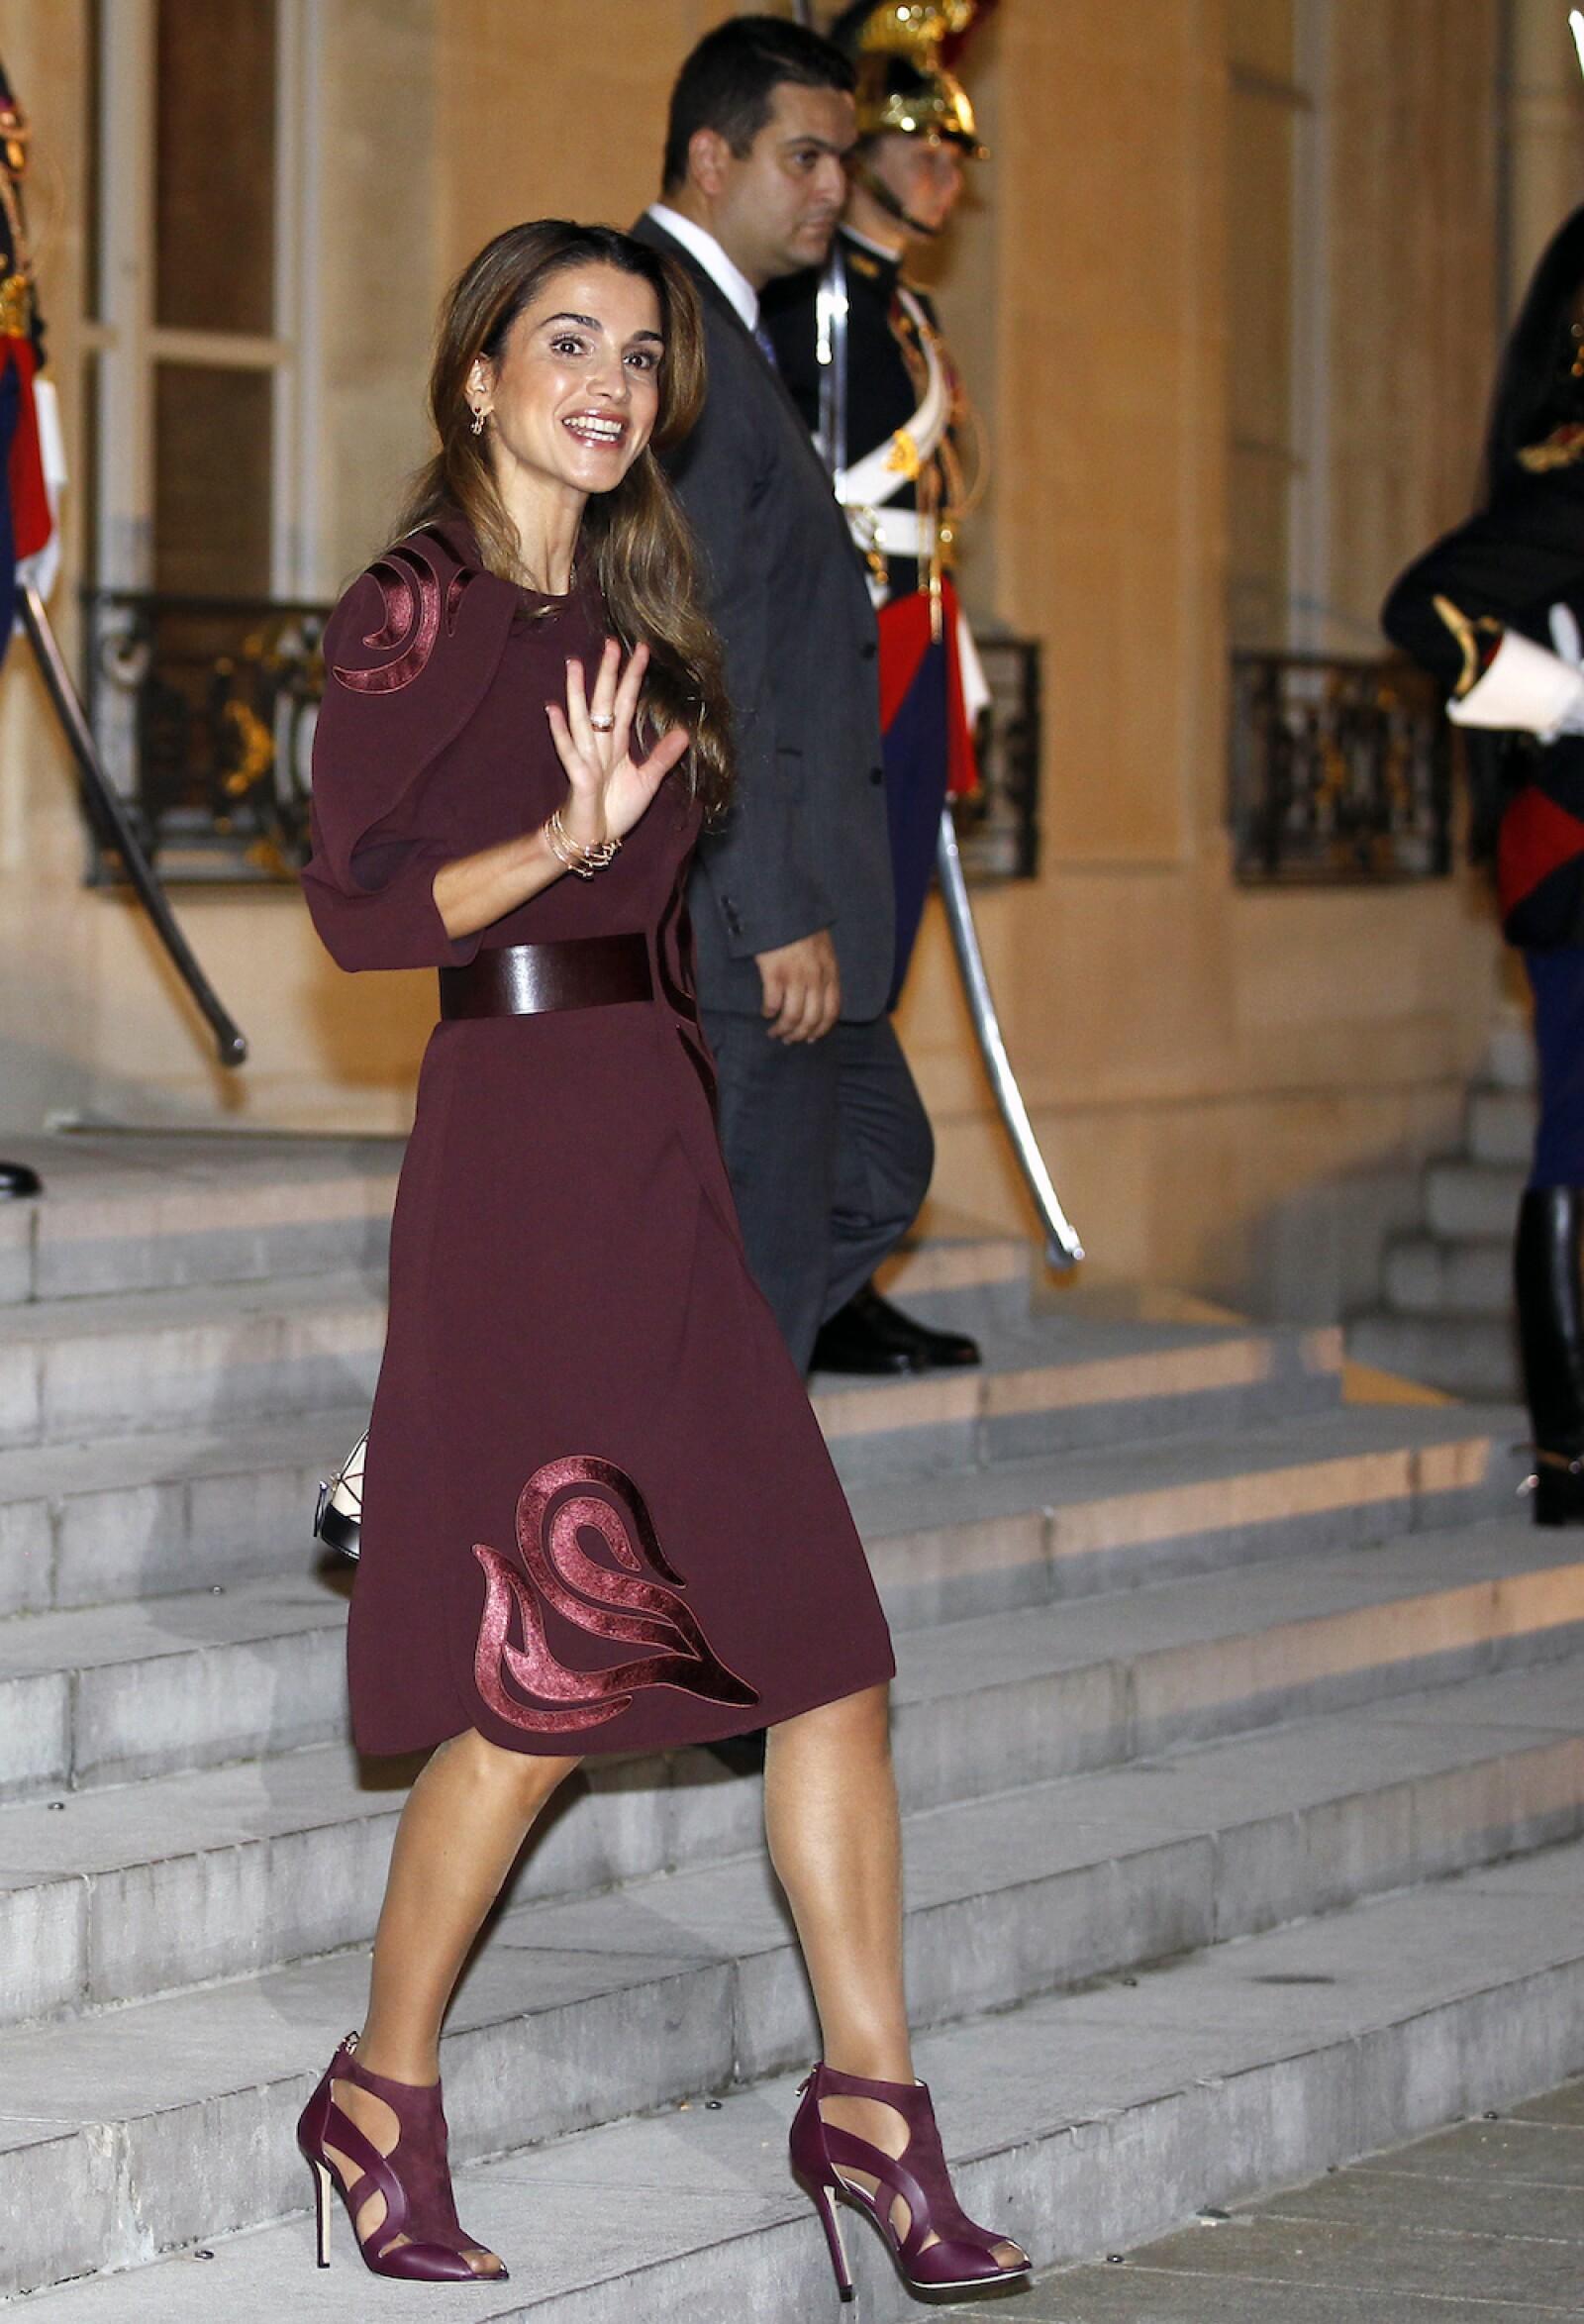 French President Francois Hollande Receives King Abdallah II of Jordan At Elysee Palace in Paris